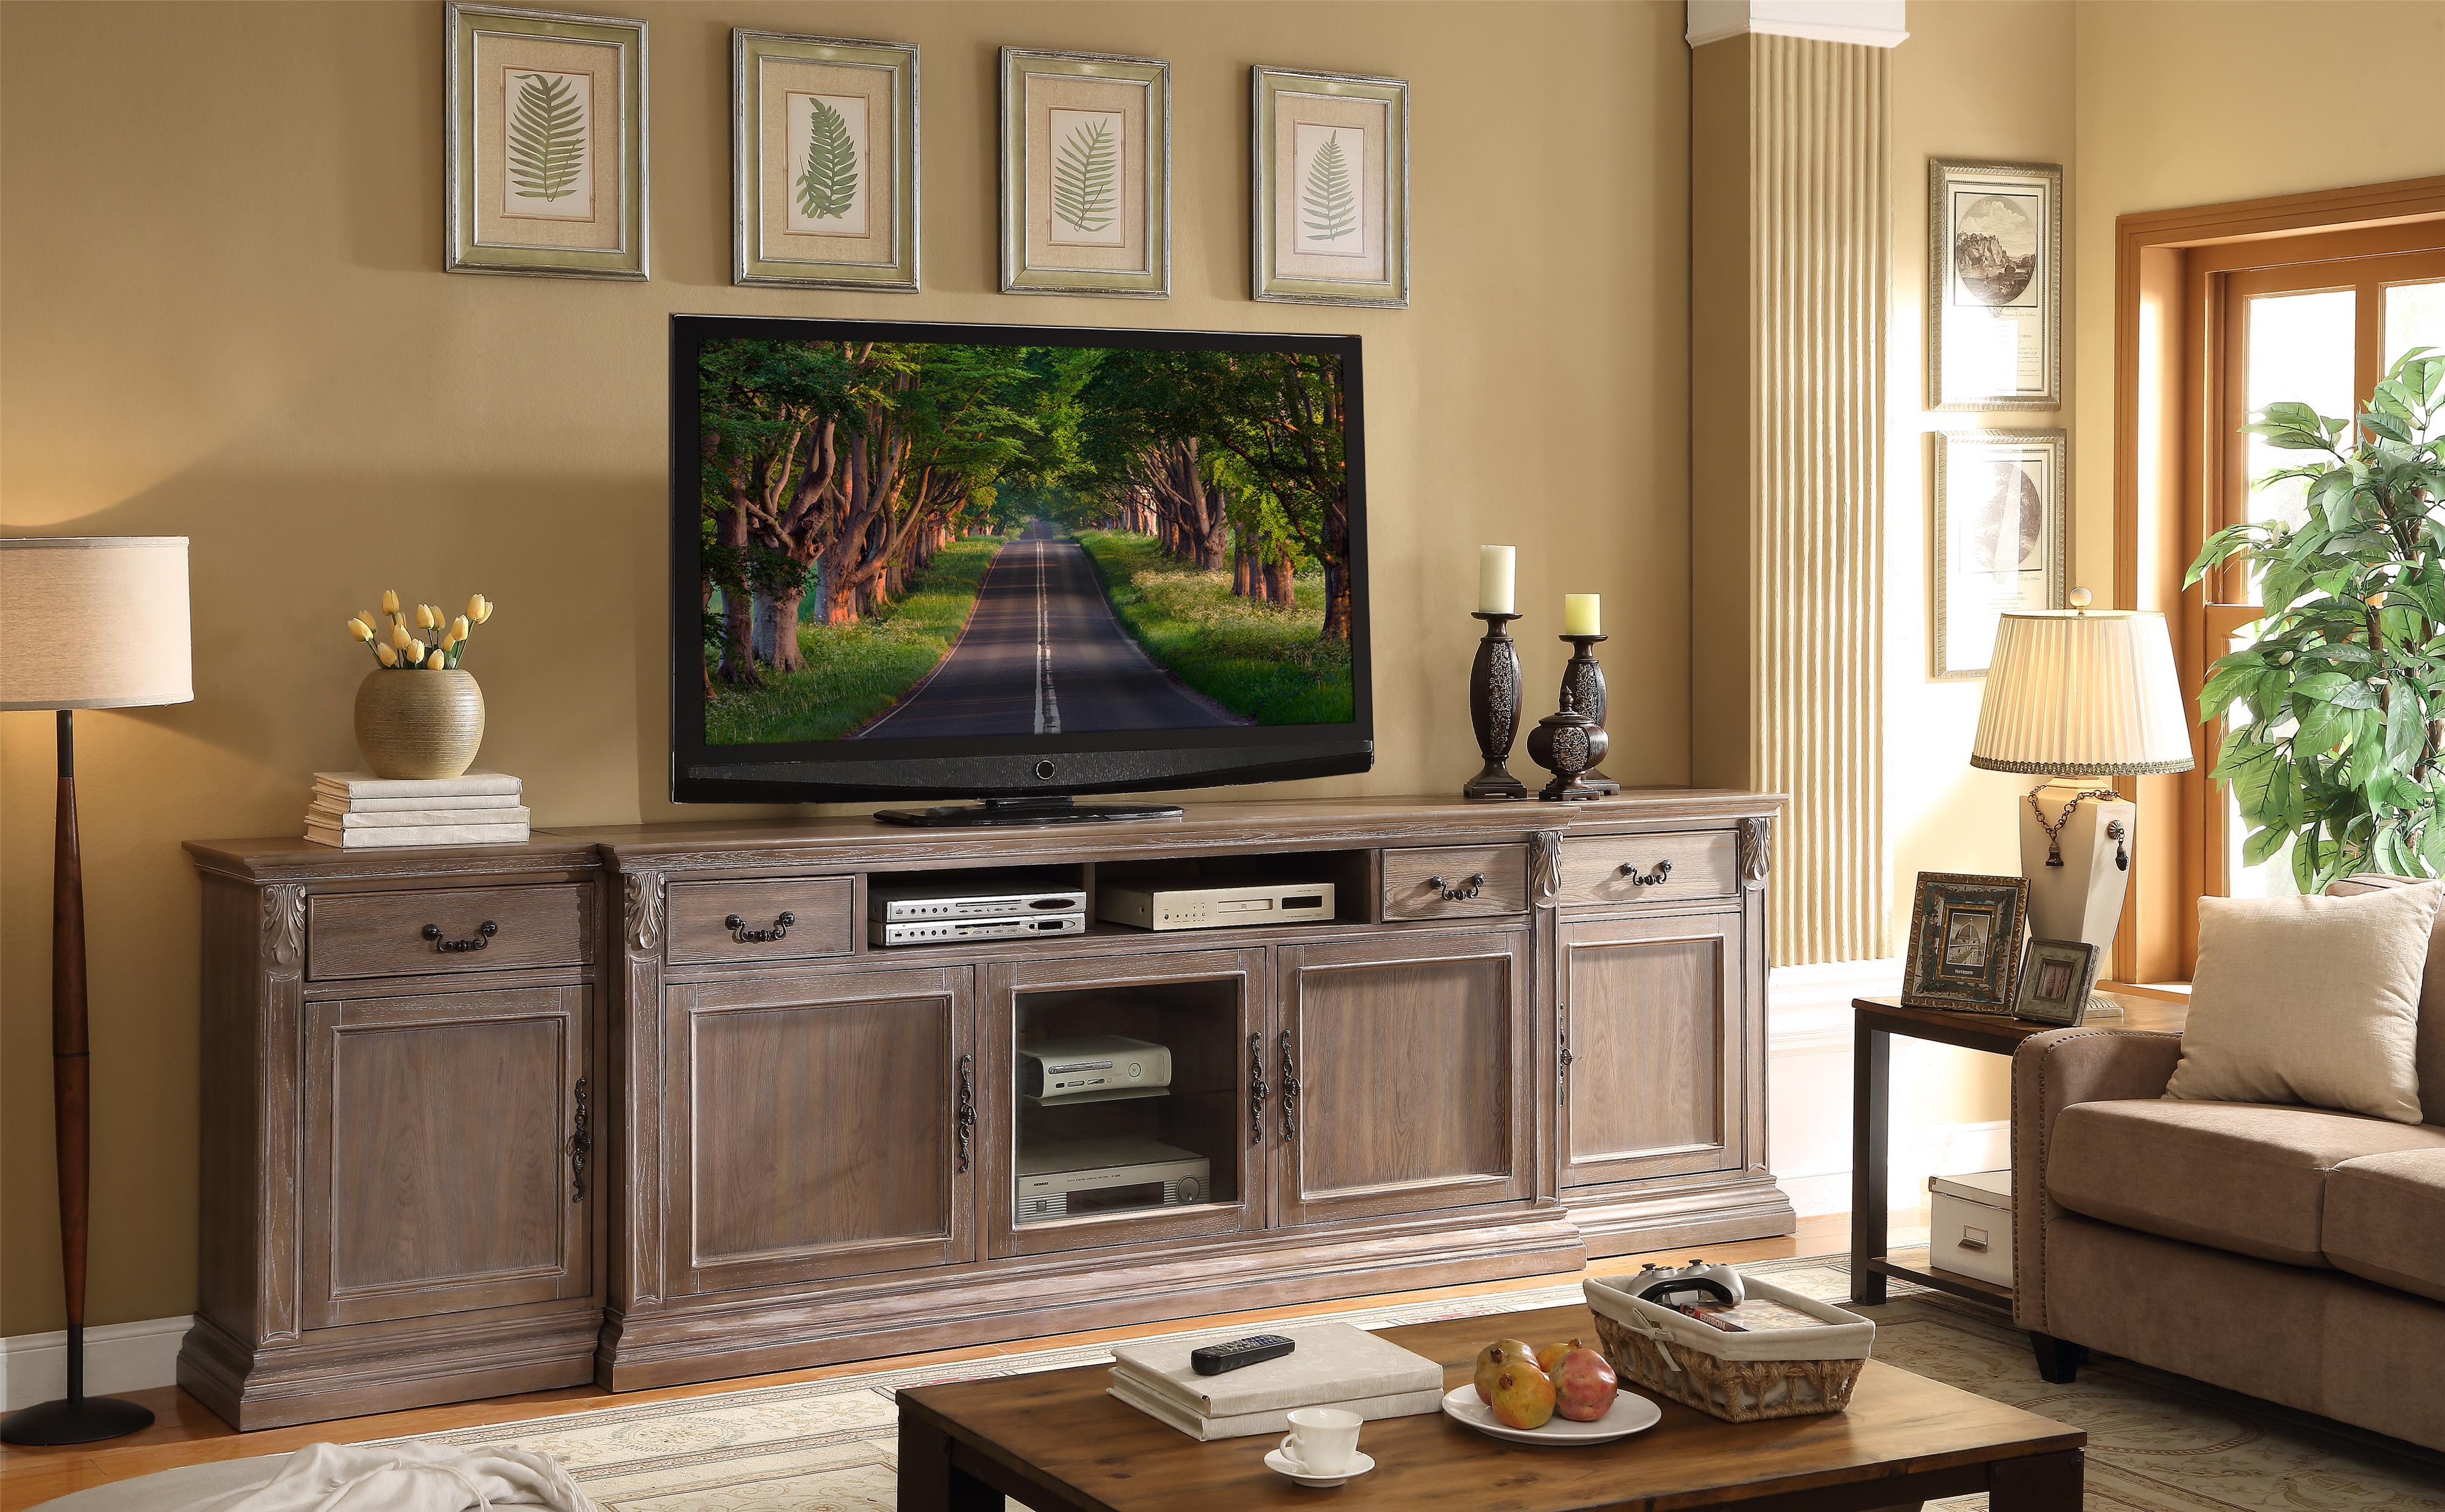 Legends Furniture Estancia Collection Entertainment Half Wall - Item Number: ZEST-1786+3001